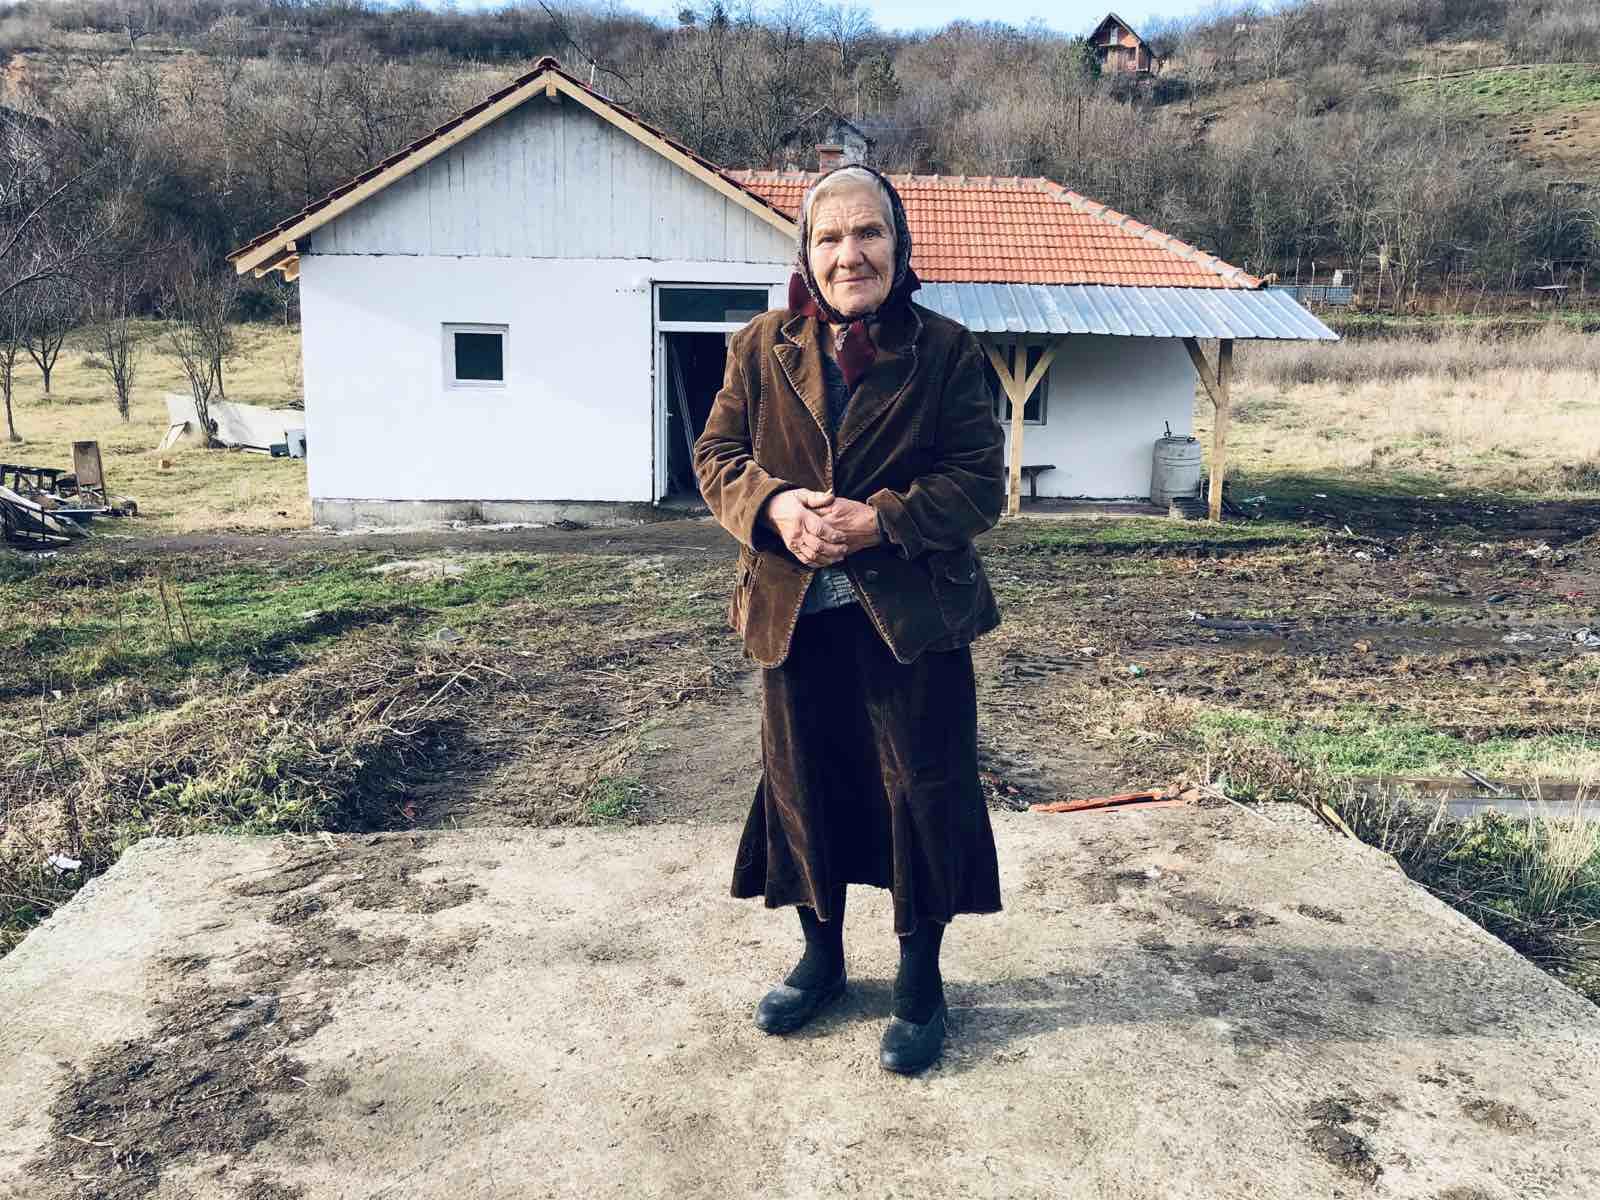 baka jelka ispred nove kuće